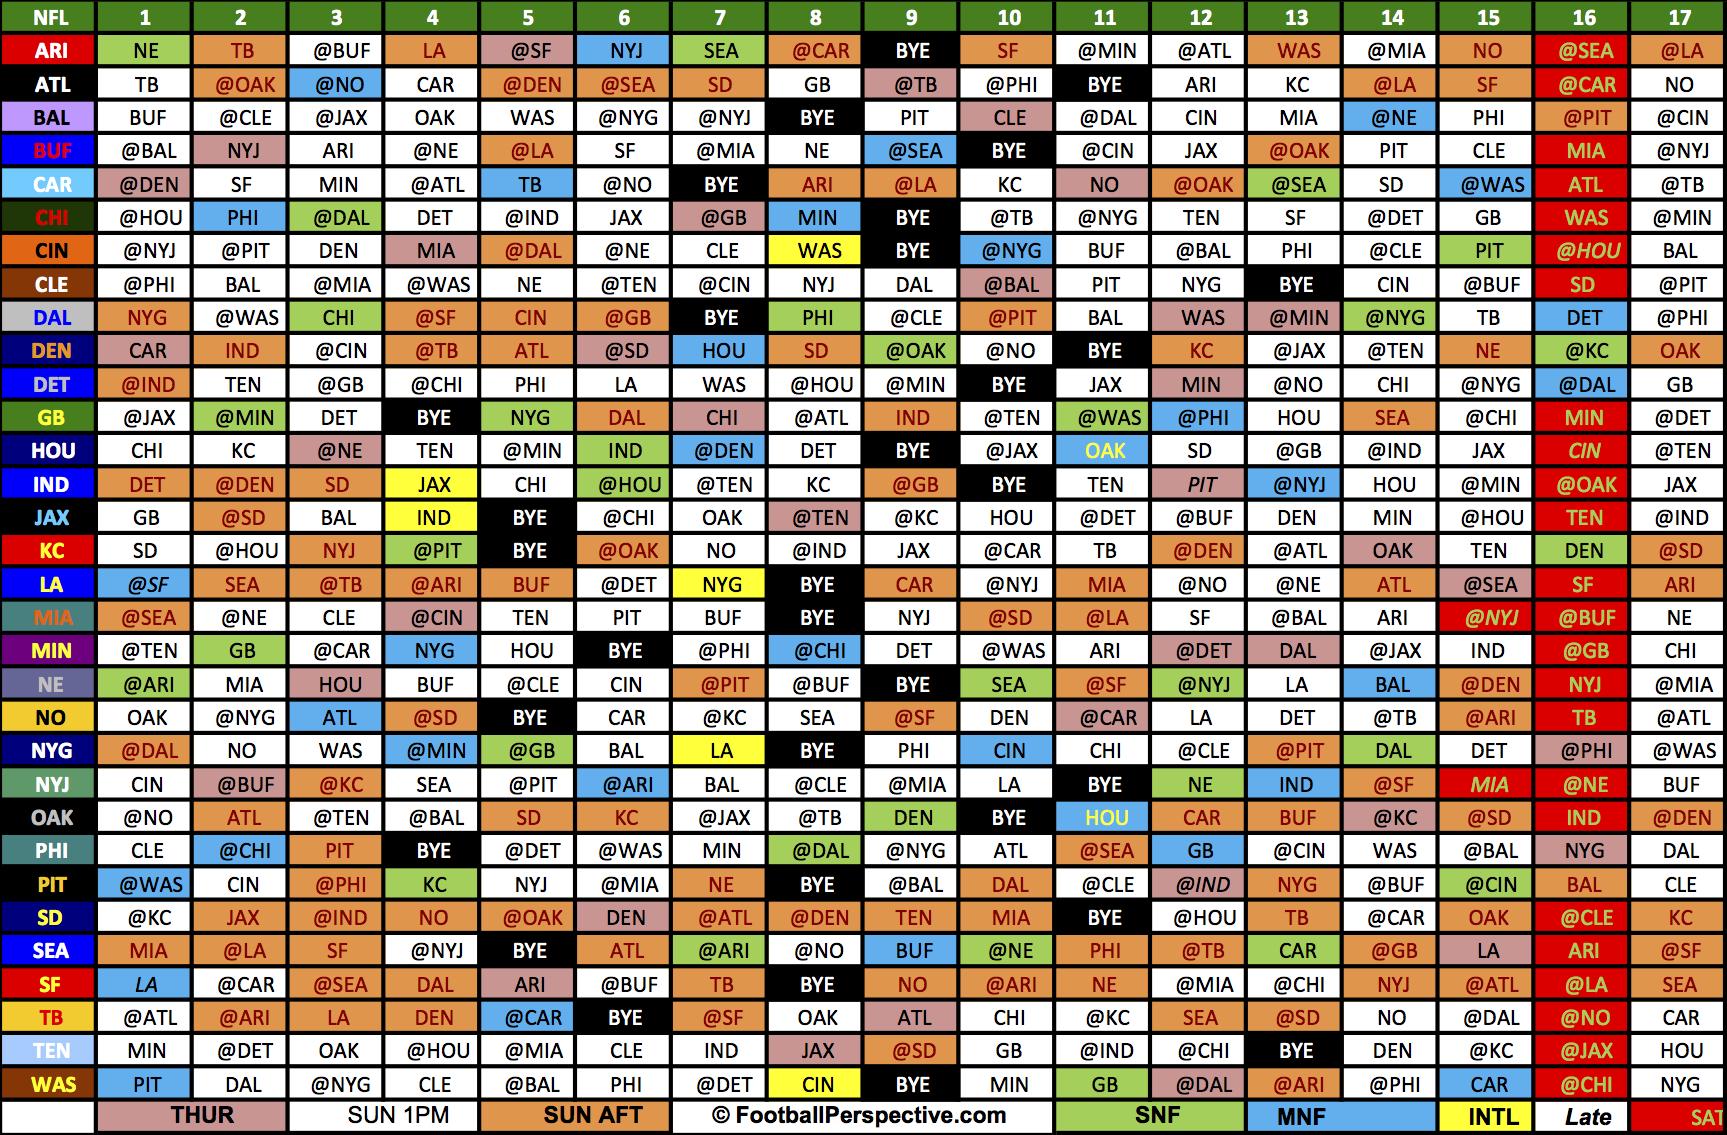 The 2016 Nfl Schedule-Printable 2021 Full Nfl Schedule